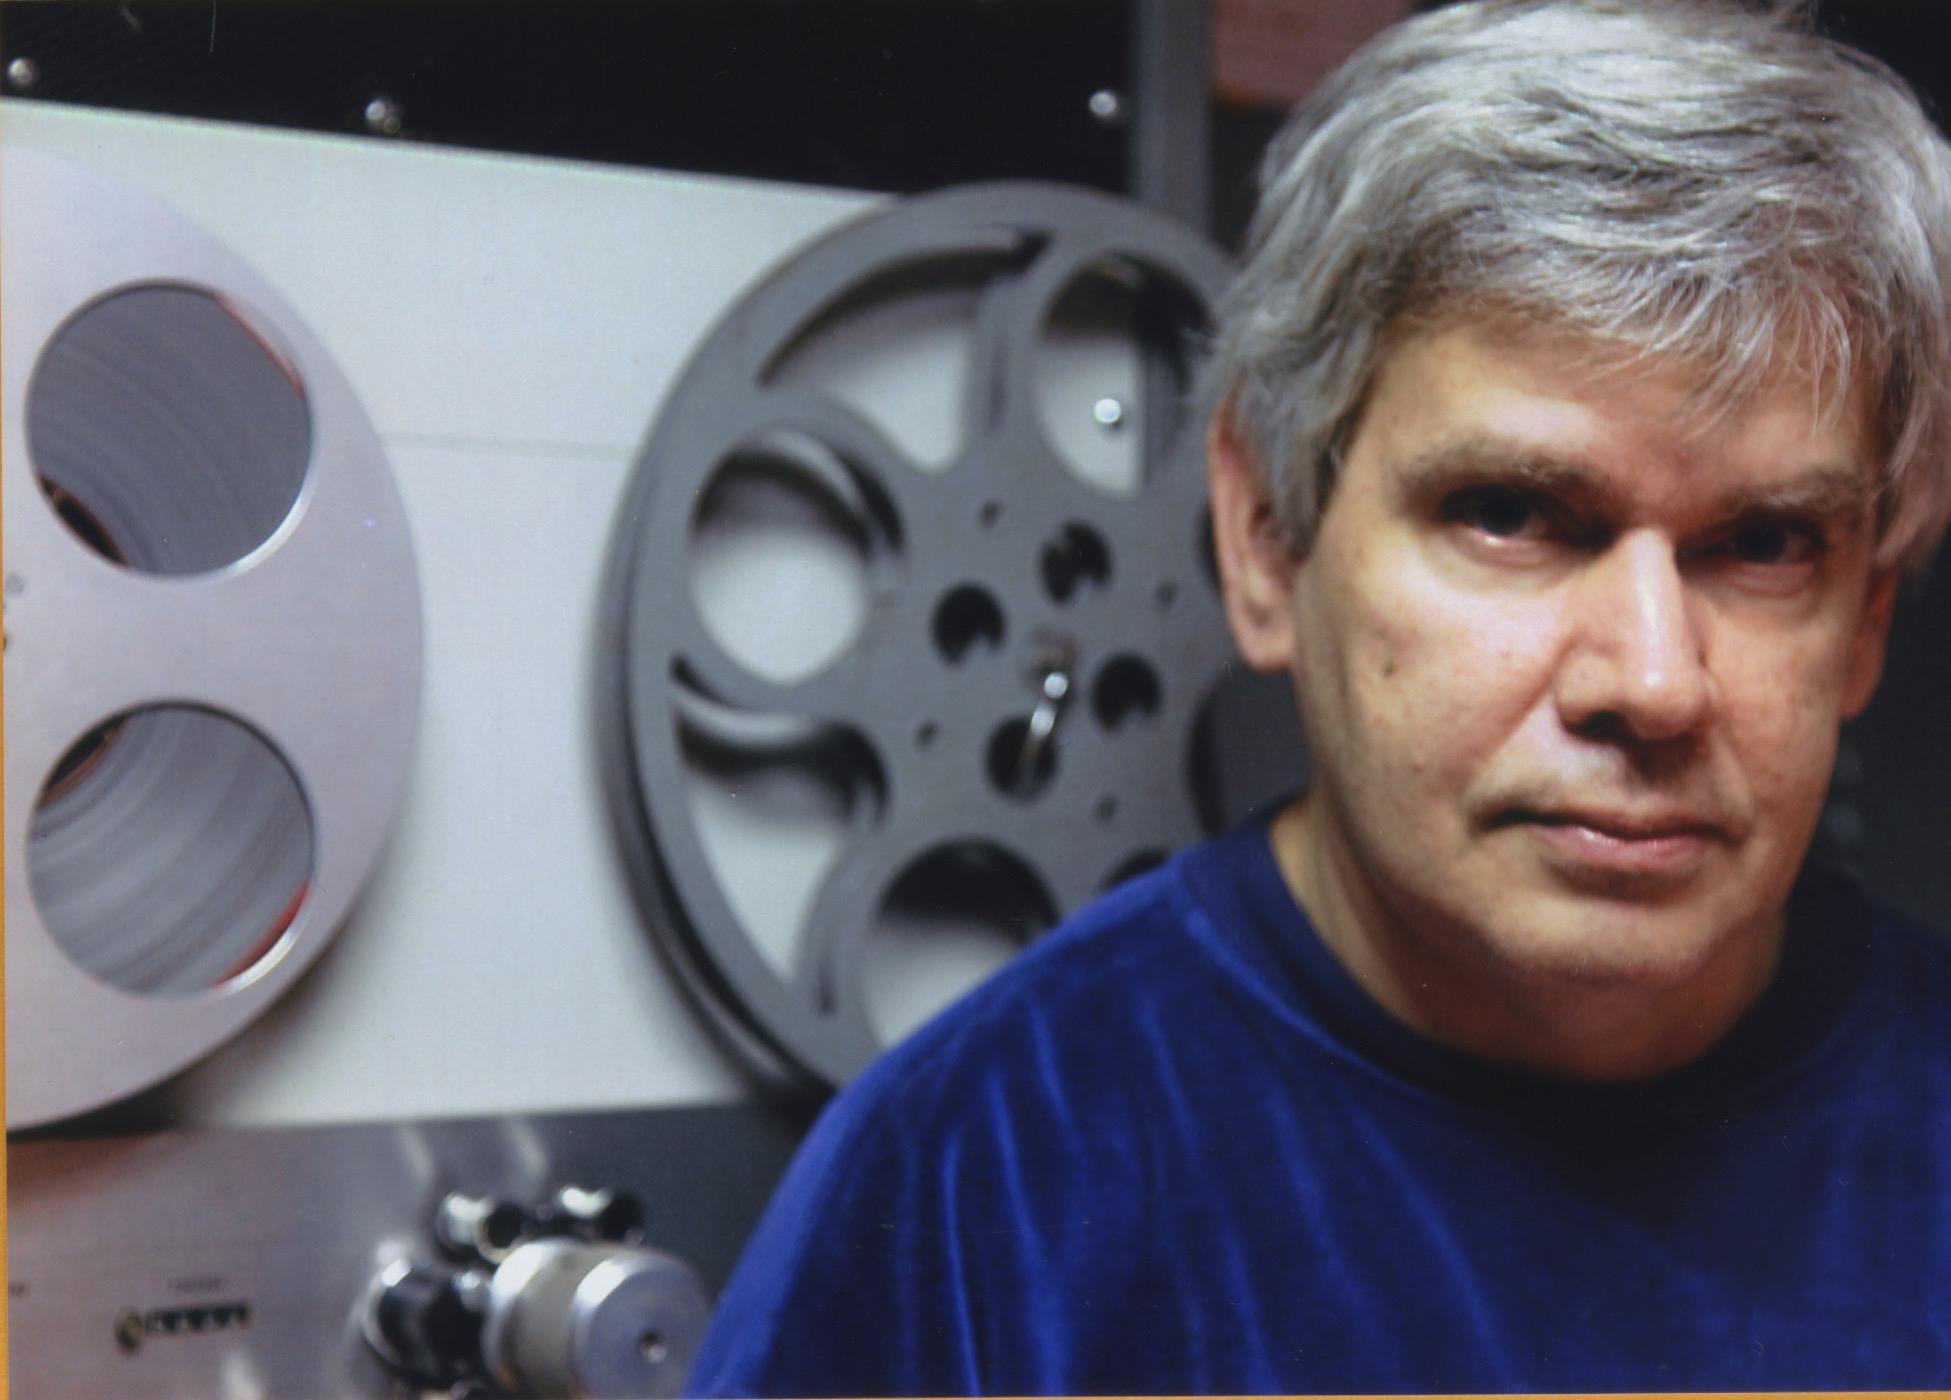 john gianviot with film reels behind him